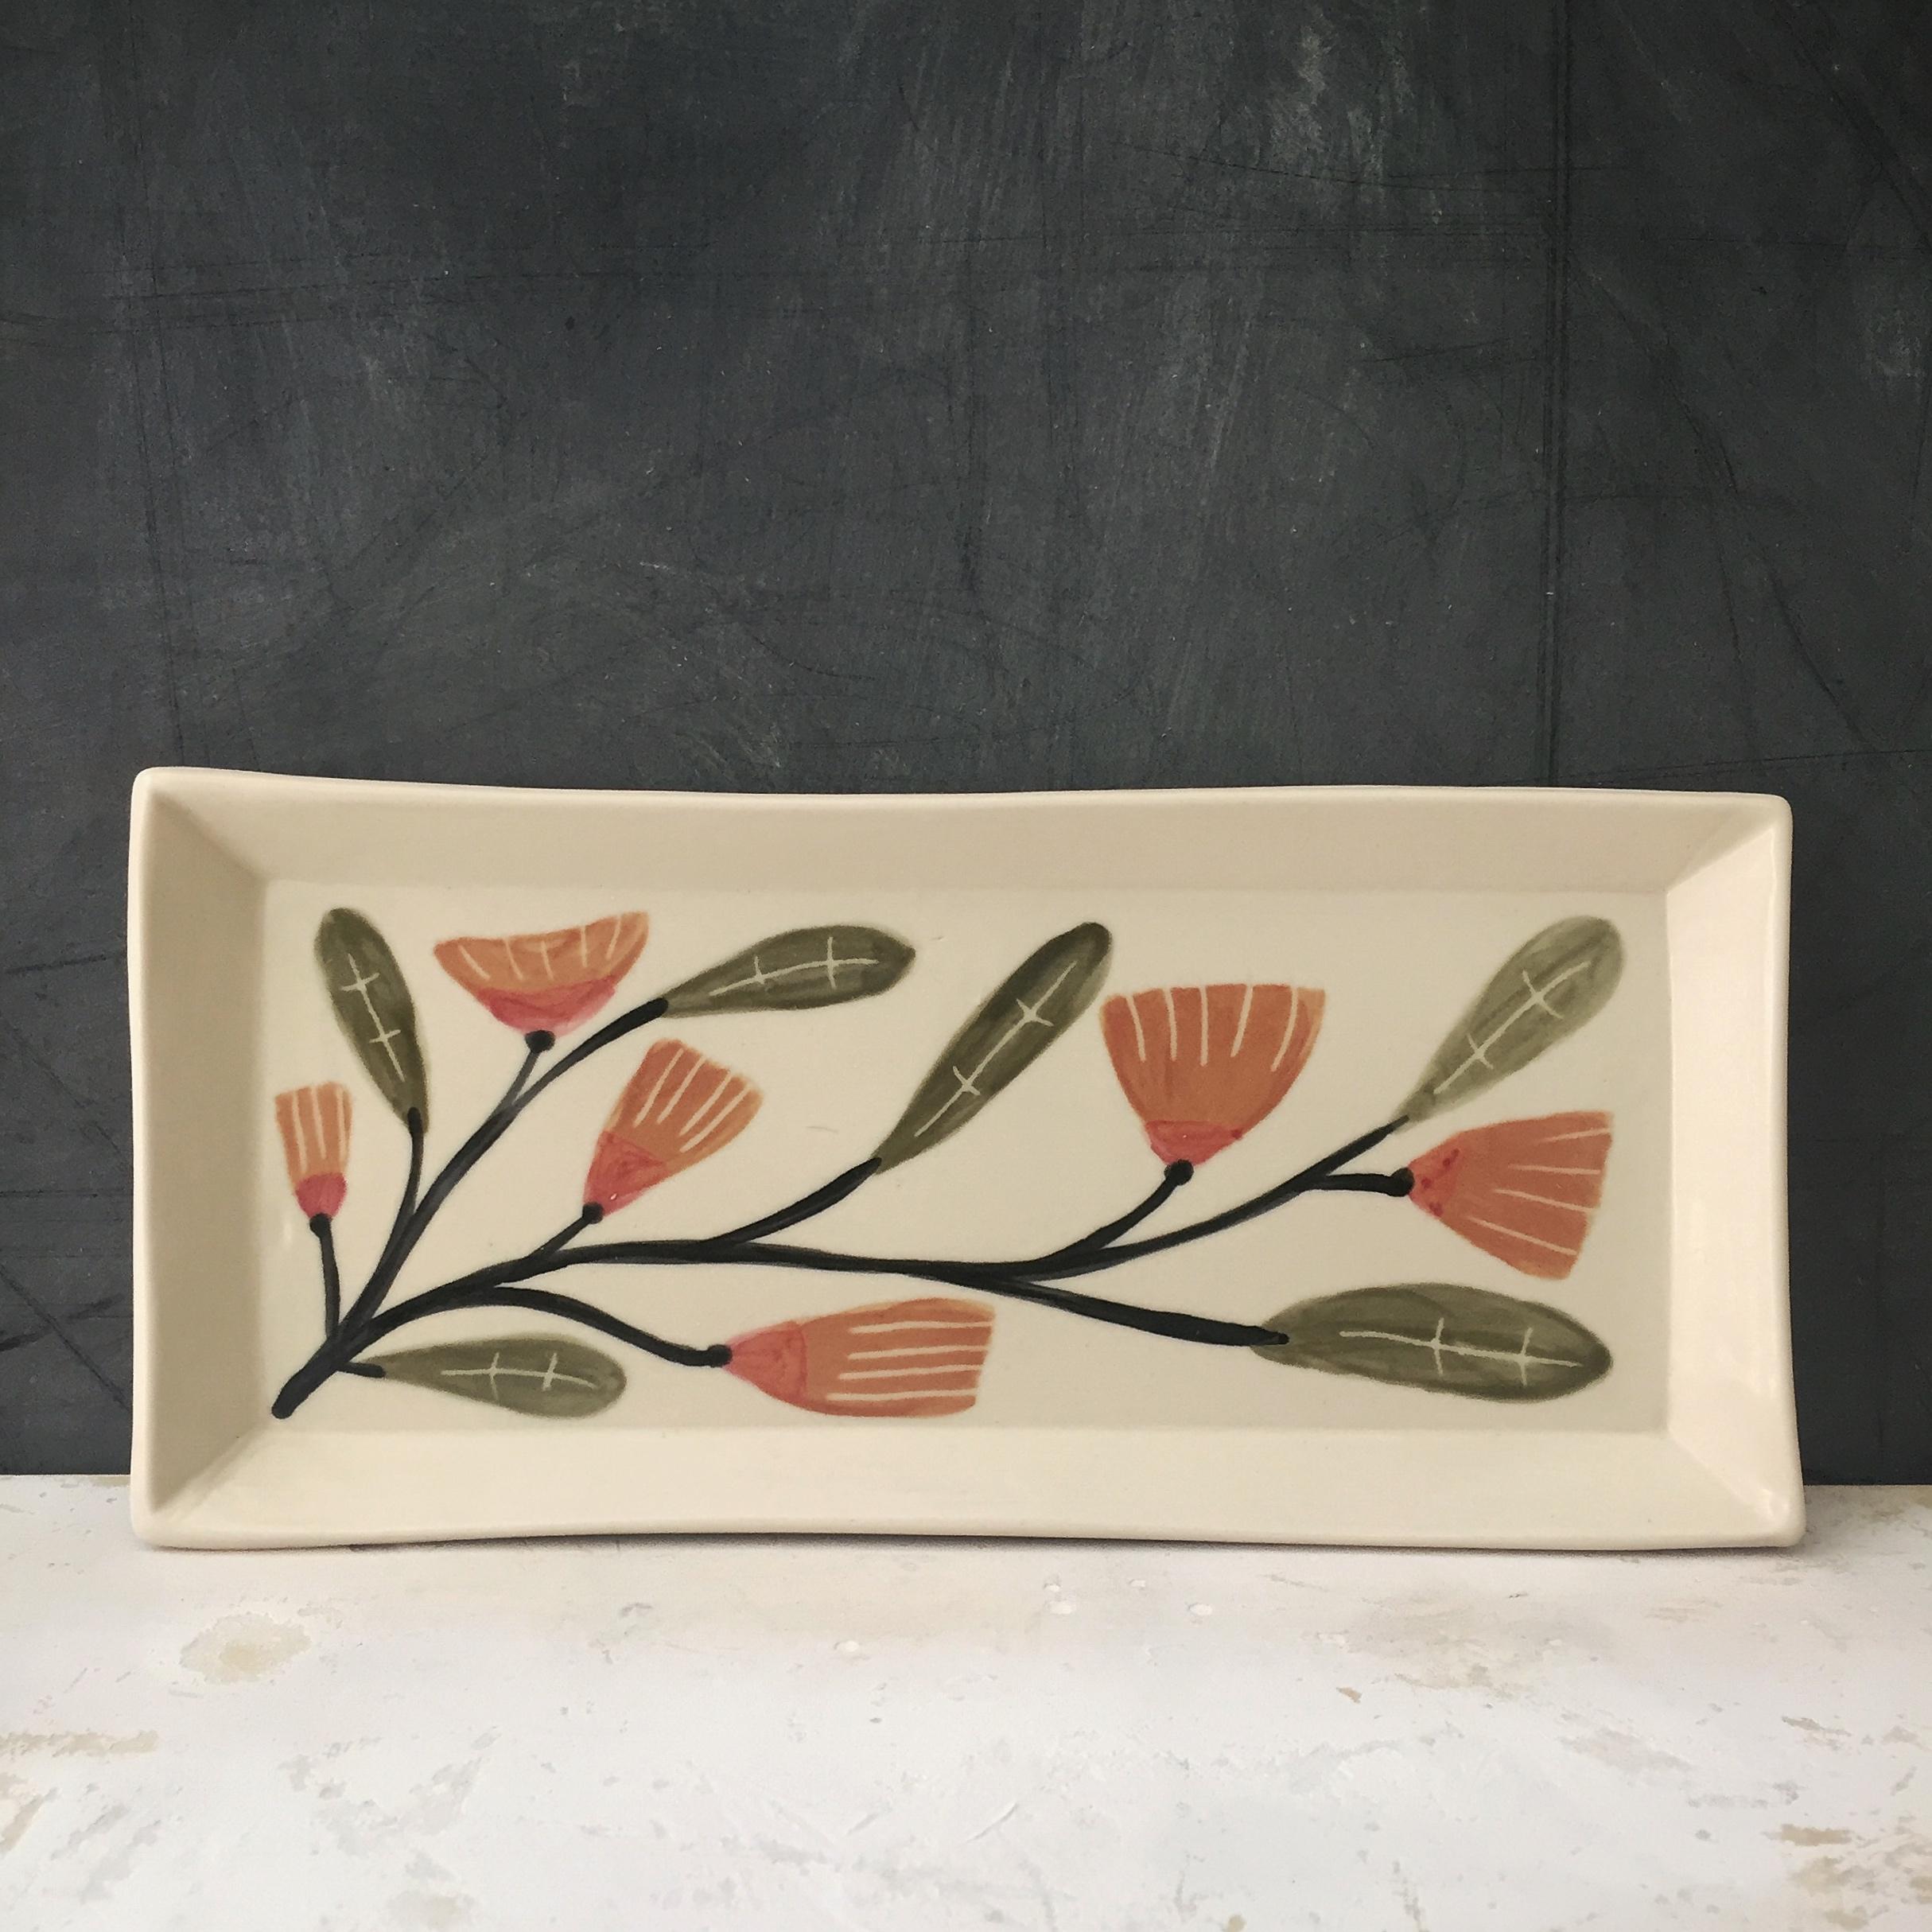 schaffner-flower-vine-R-tray.JPG